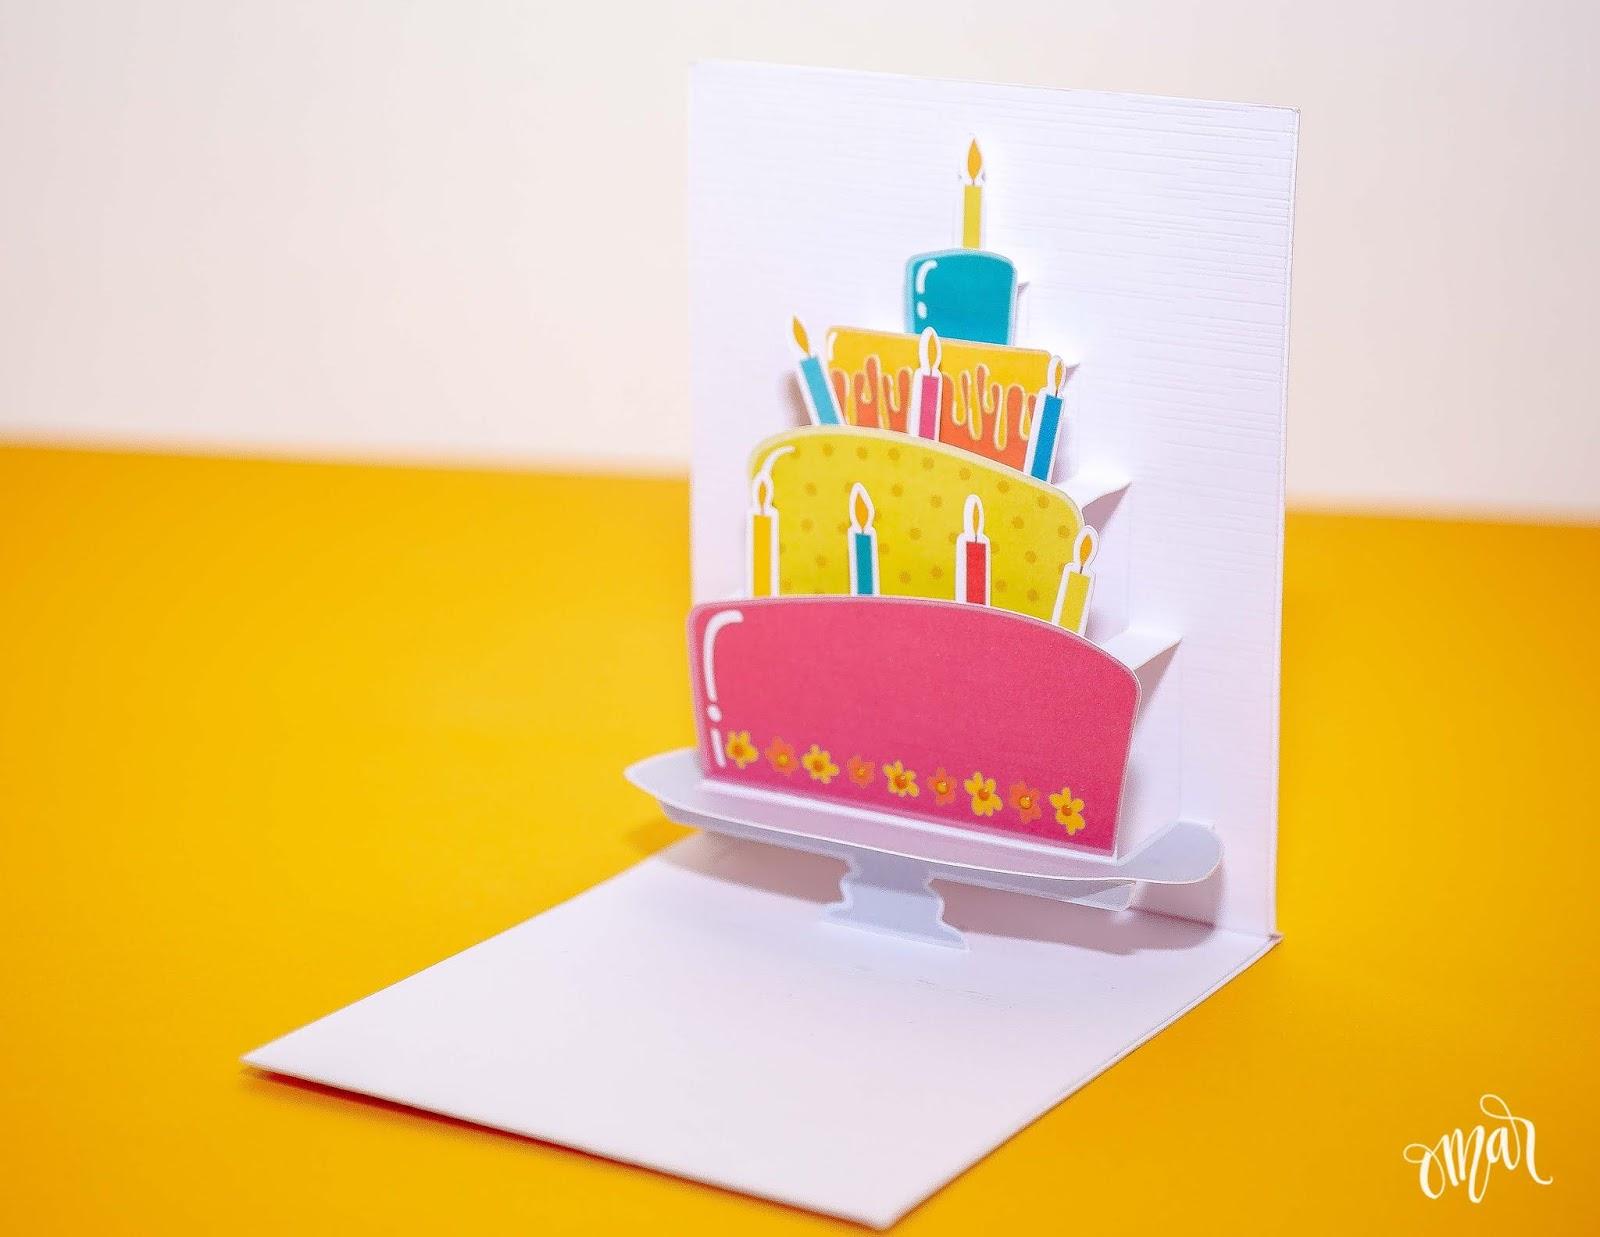 Astonishing Awesome Svgs Layered Cake Pop Up Bithday Card Personalised Birthday Cards Petedlily Jamesorg